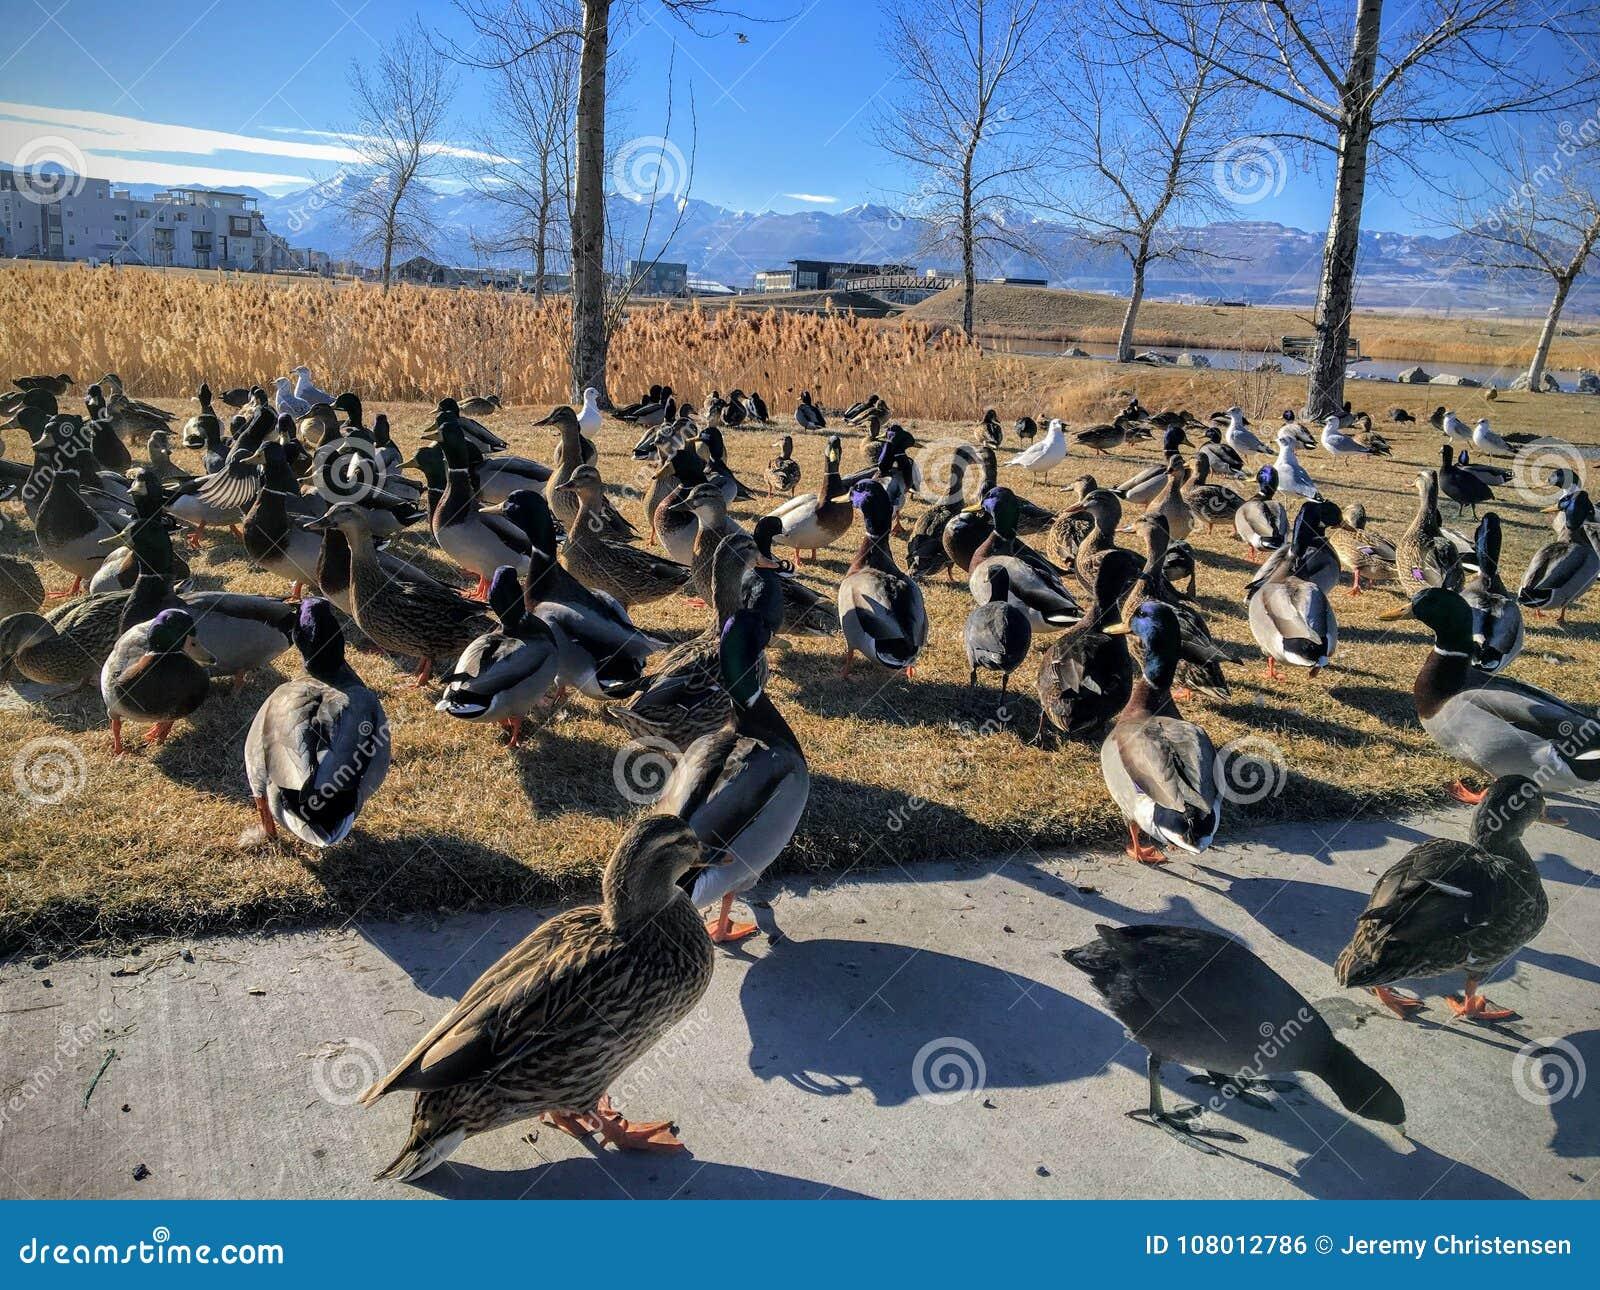 A flock of wild ducks by Daybreak lake in South Jordan Utah. Migratory birds on vacation being fed by locals.